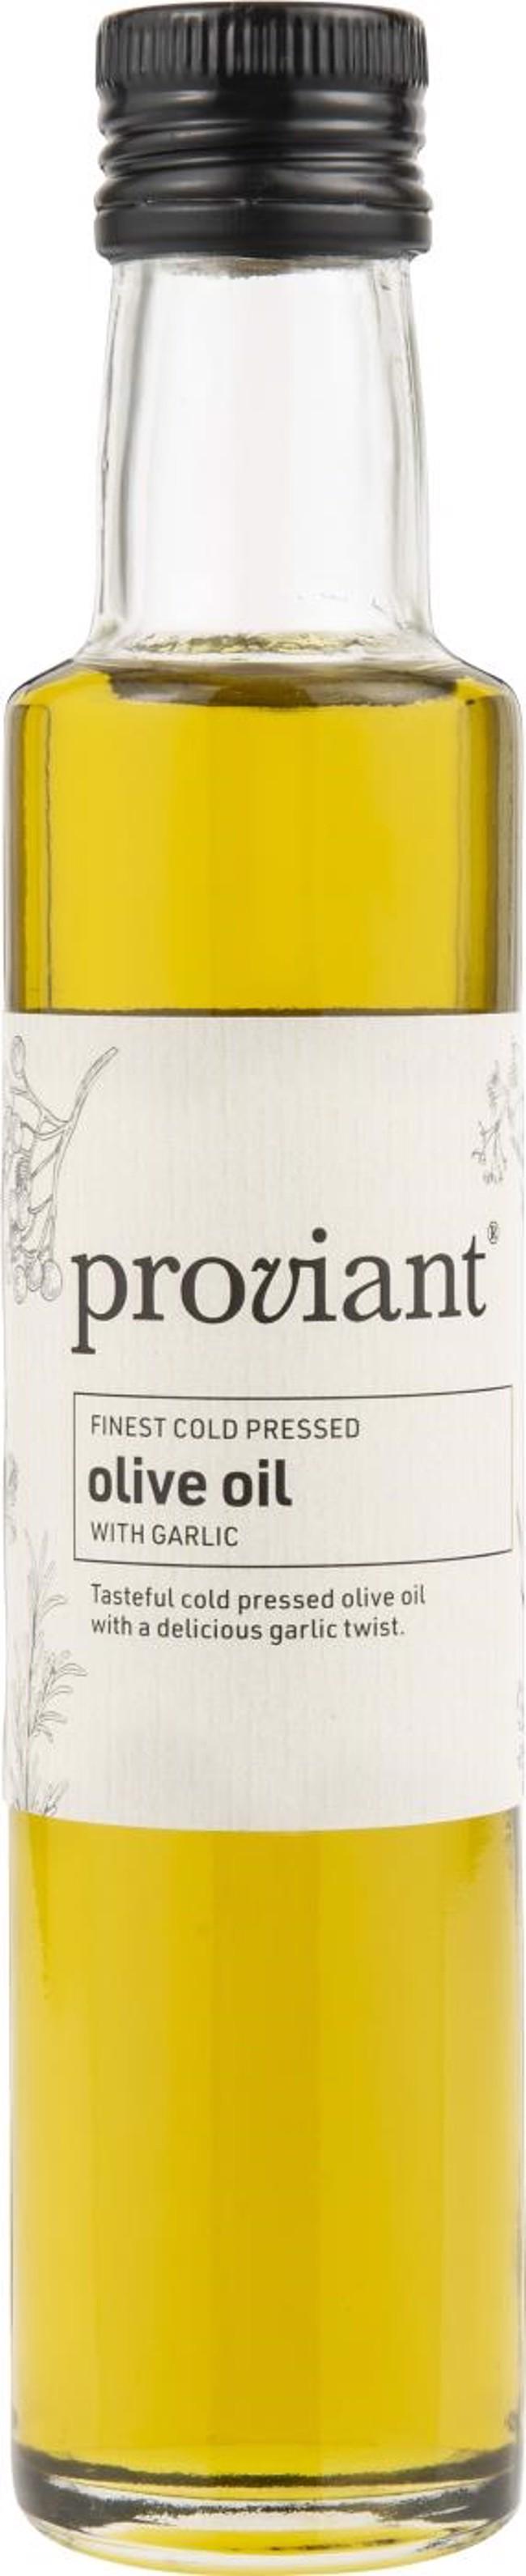 Image of   Proviant olivenolie med hvidløg 250 ml fra Ib Laursen